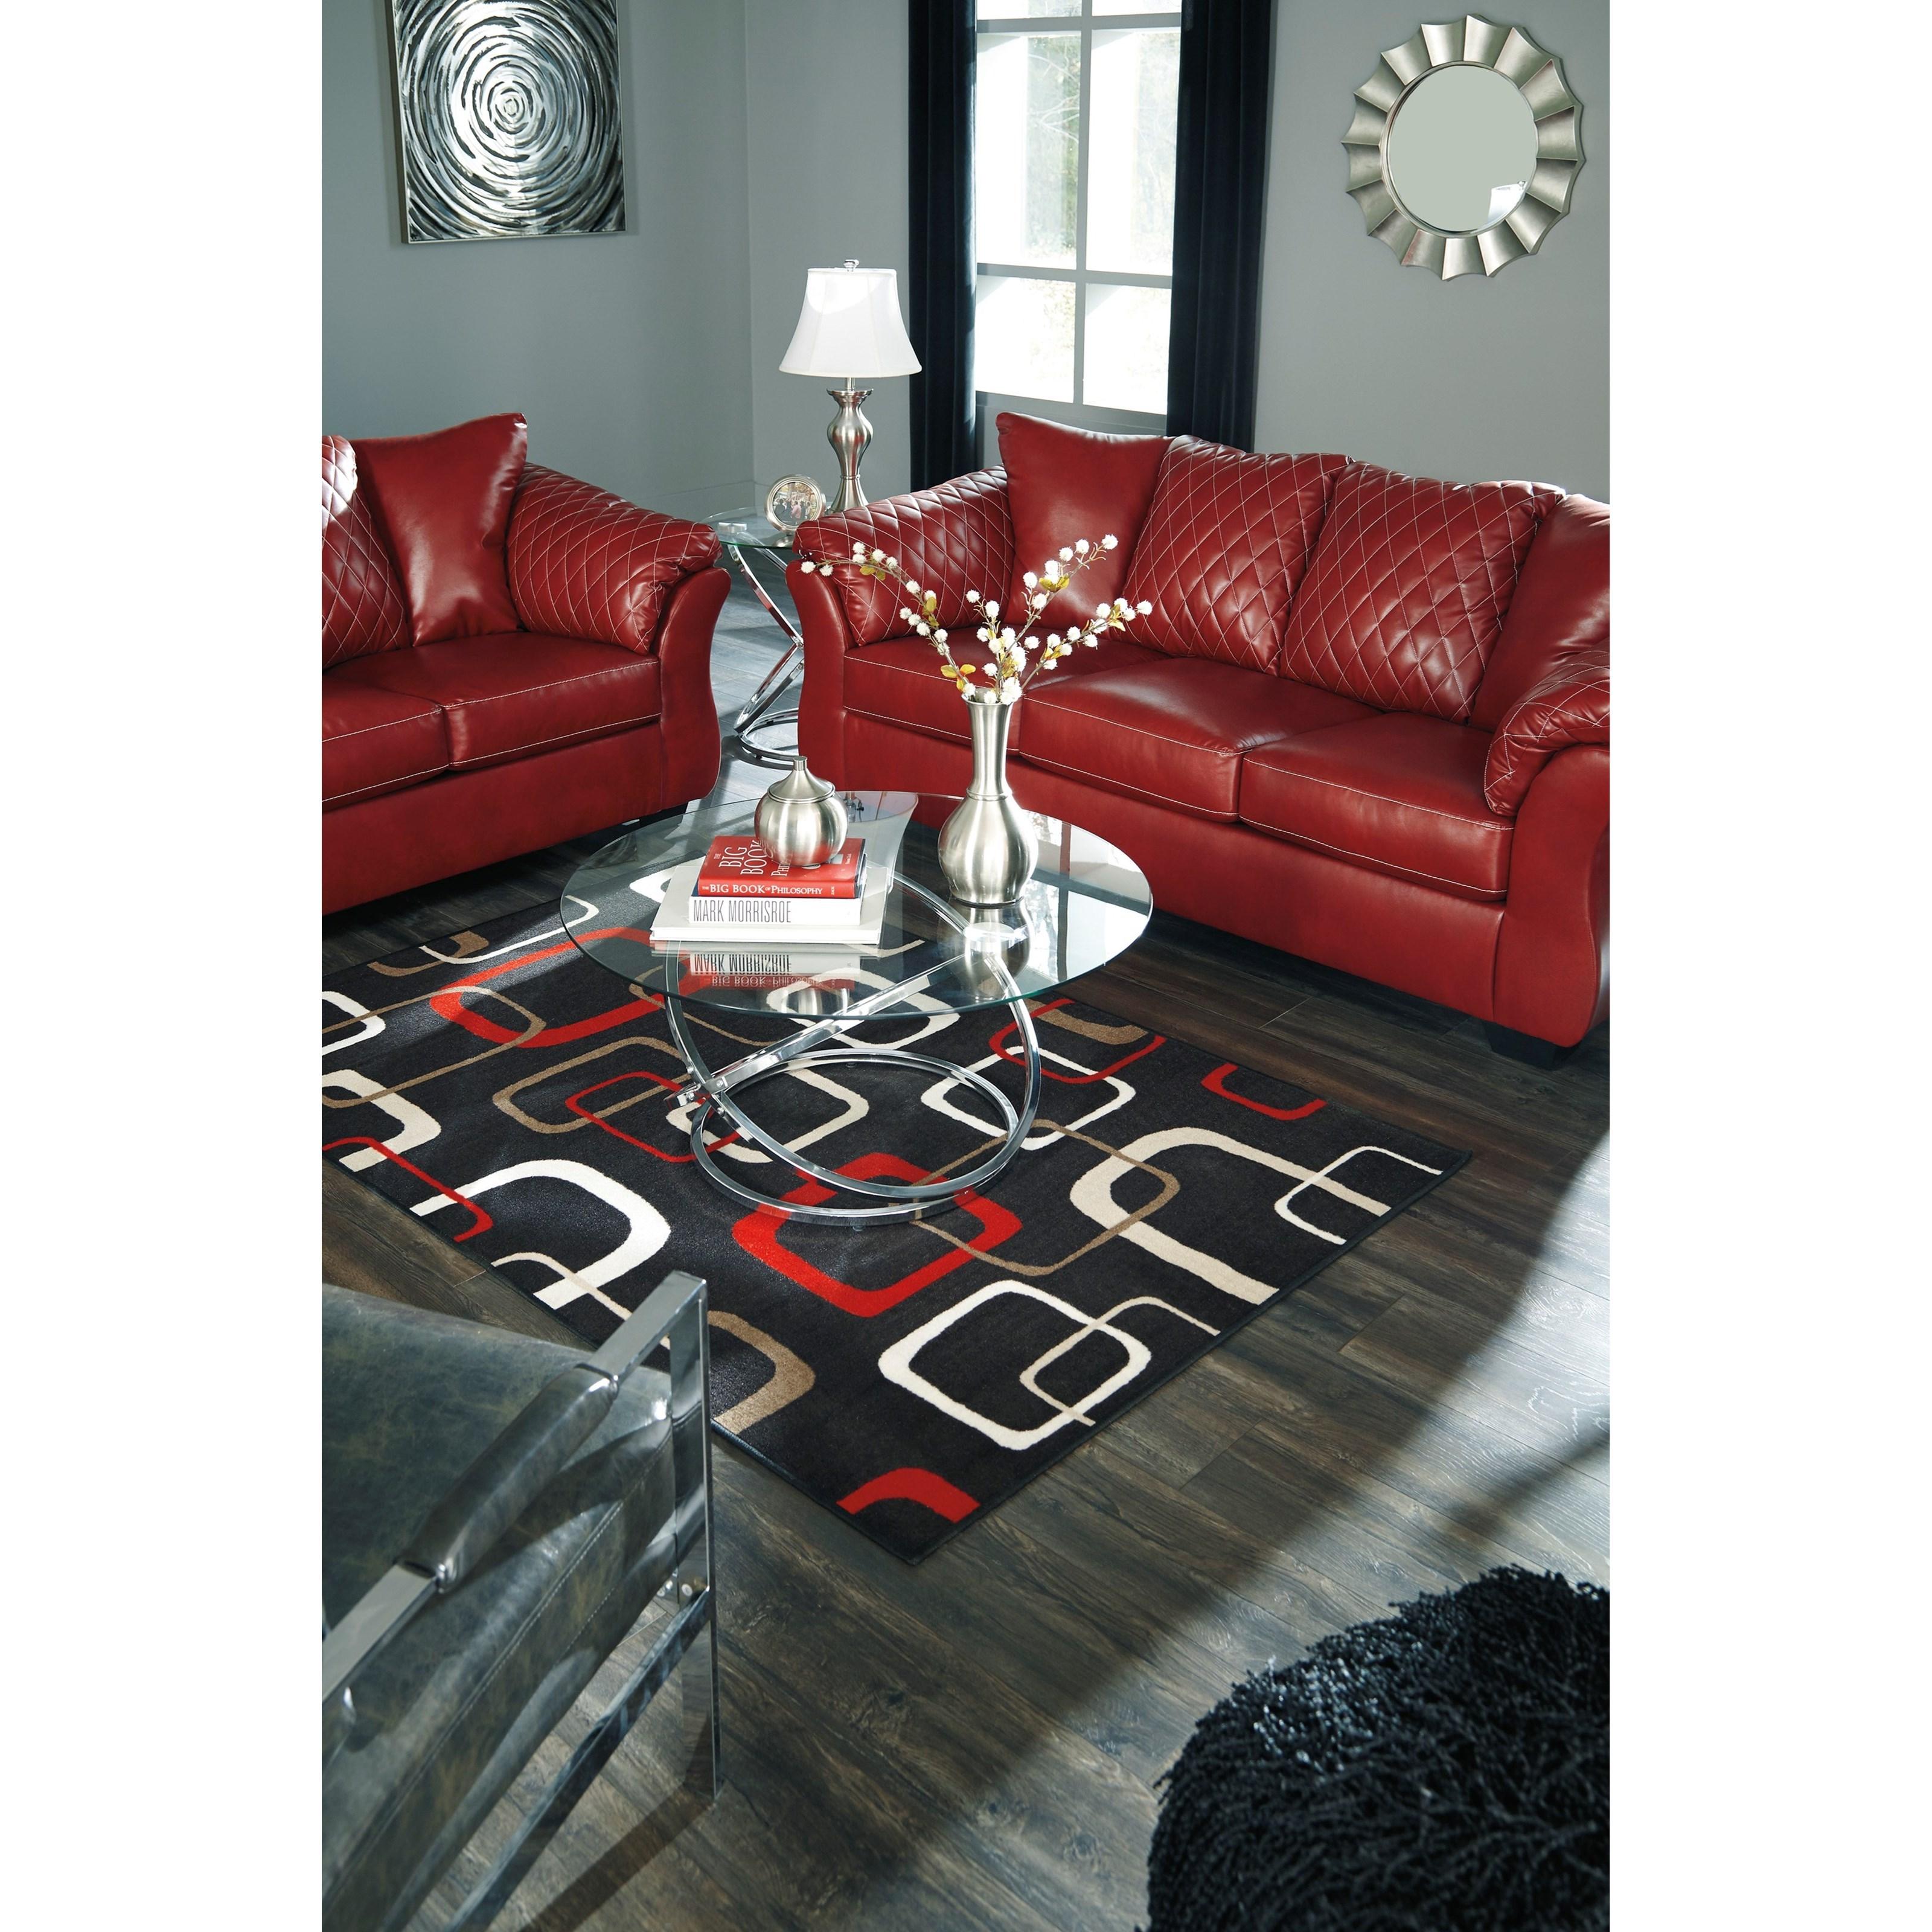 Signature Design By Ashley Betrillo Contemporary Sofa With